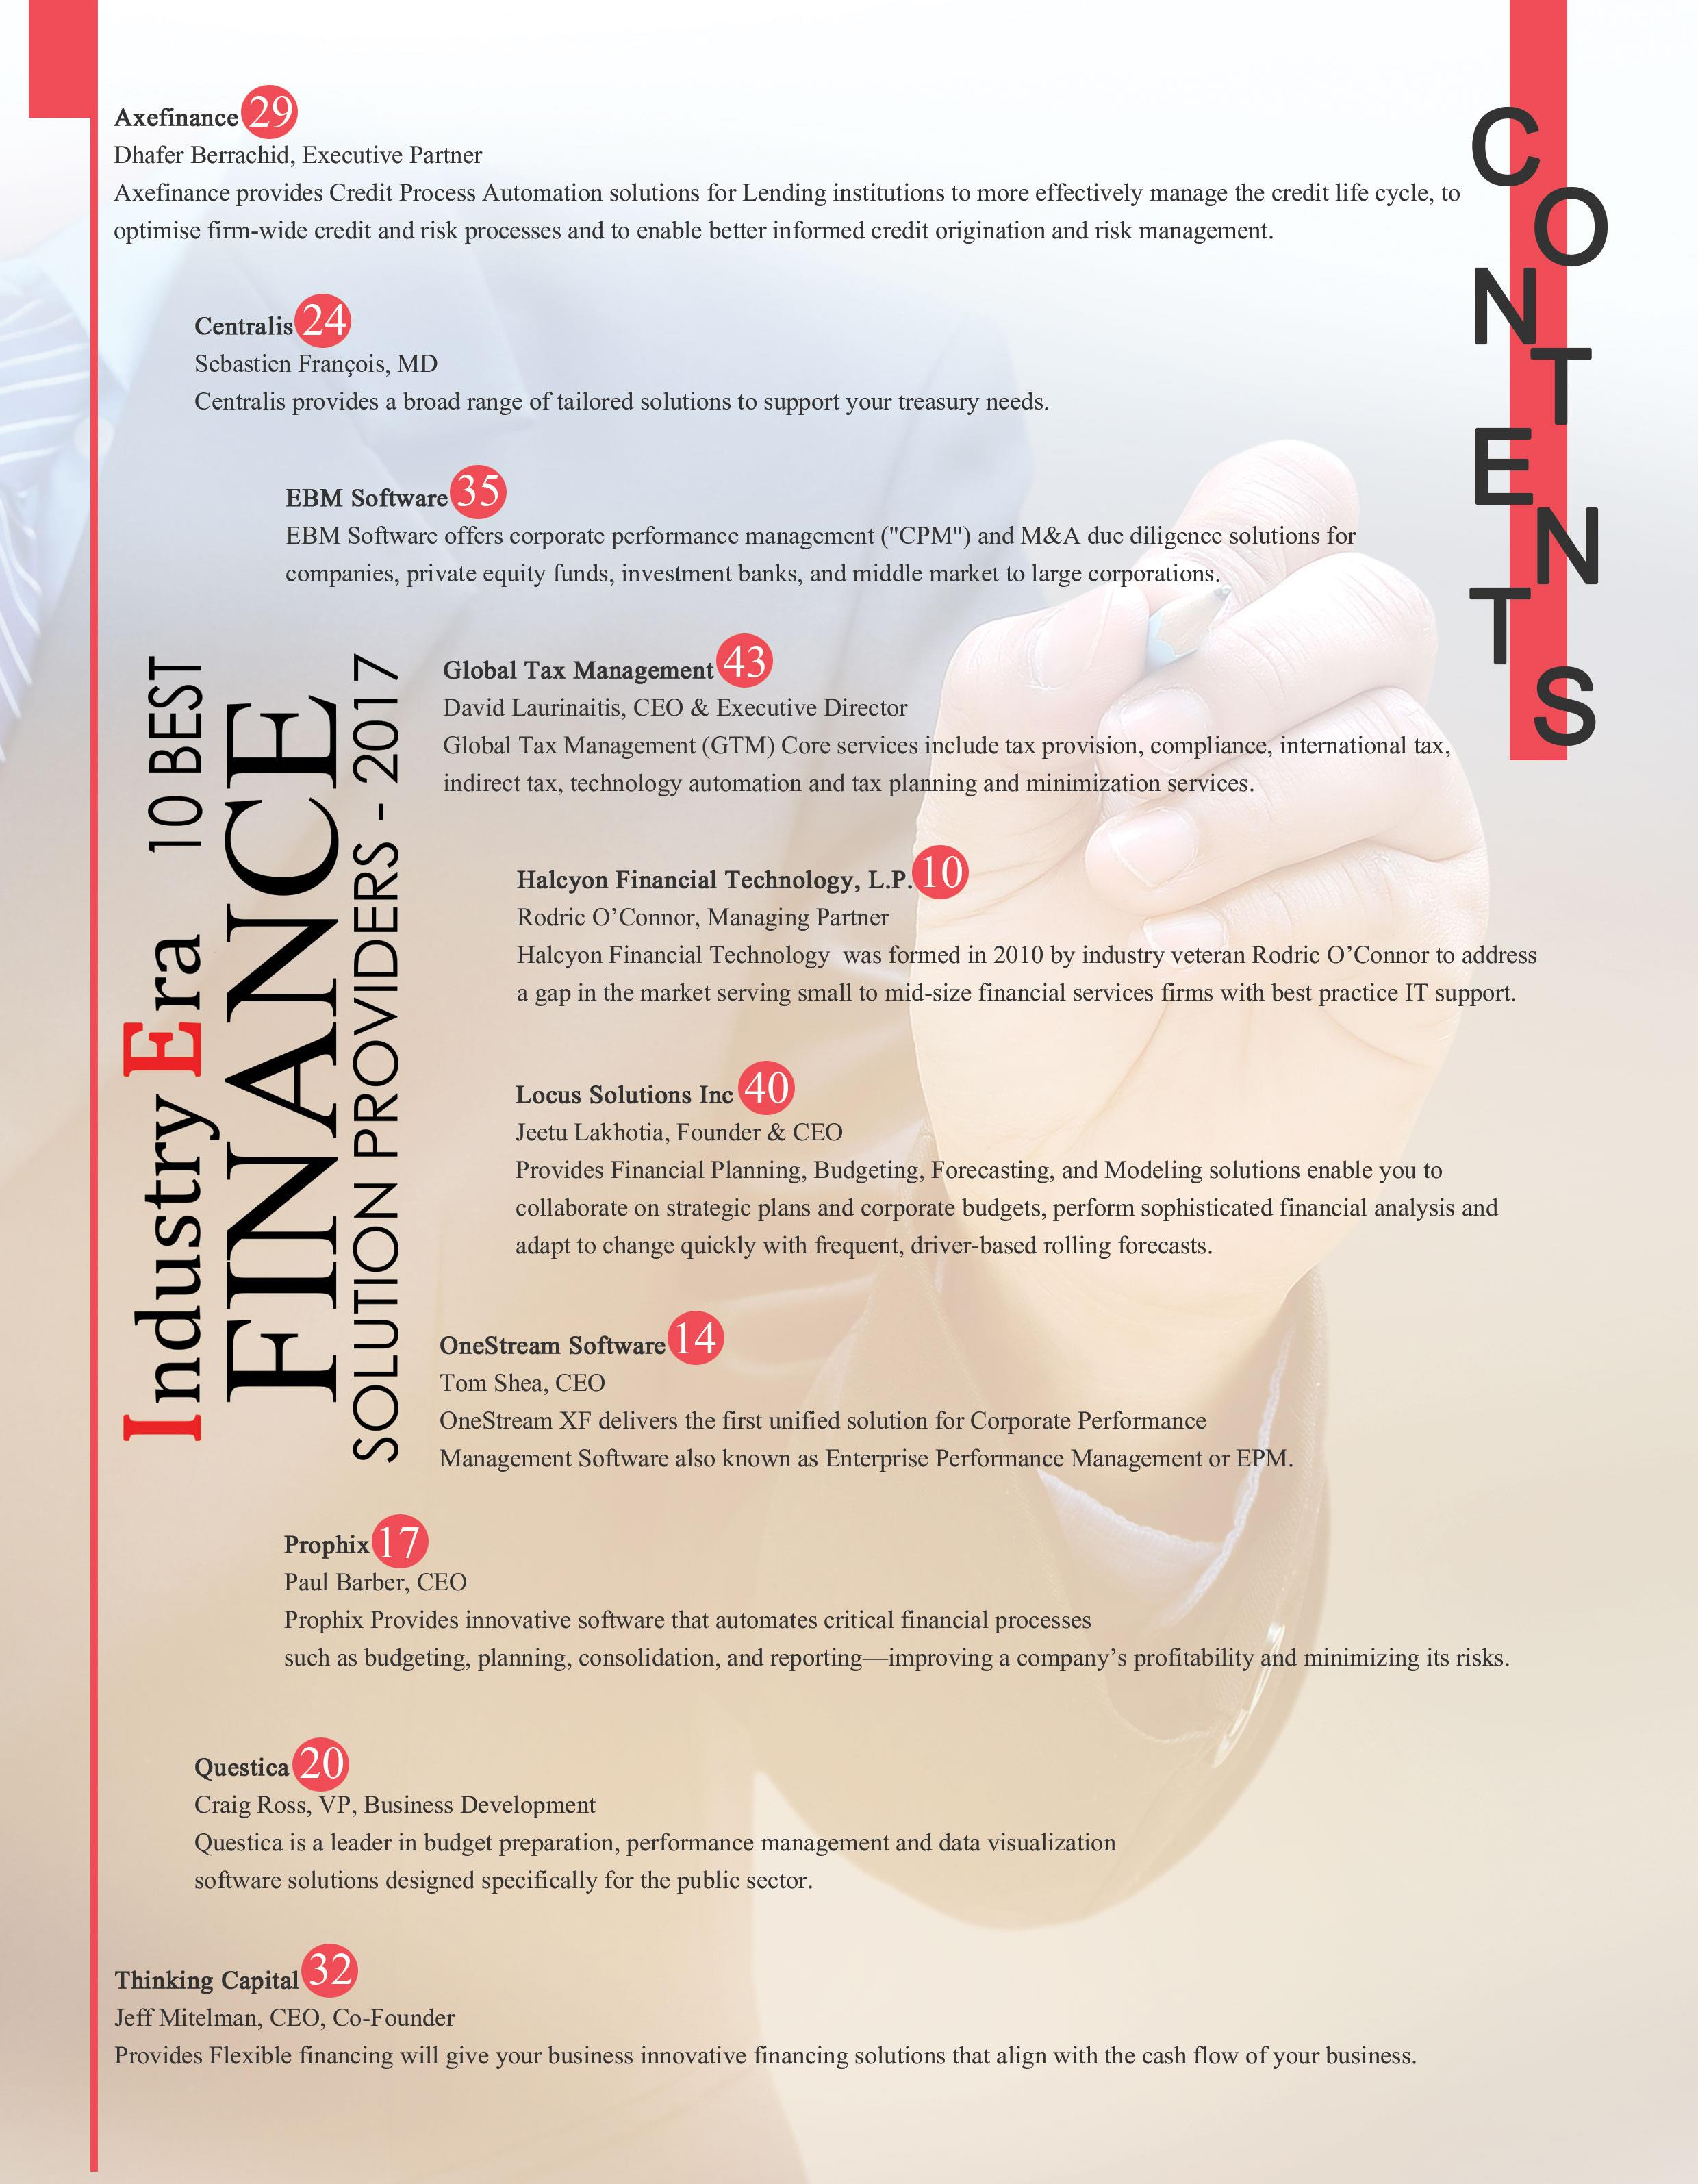 10 Best Finance Solution Providers of 2017 | Industry Era